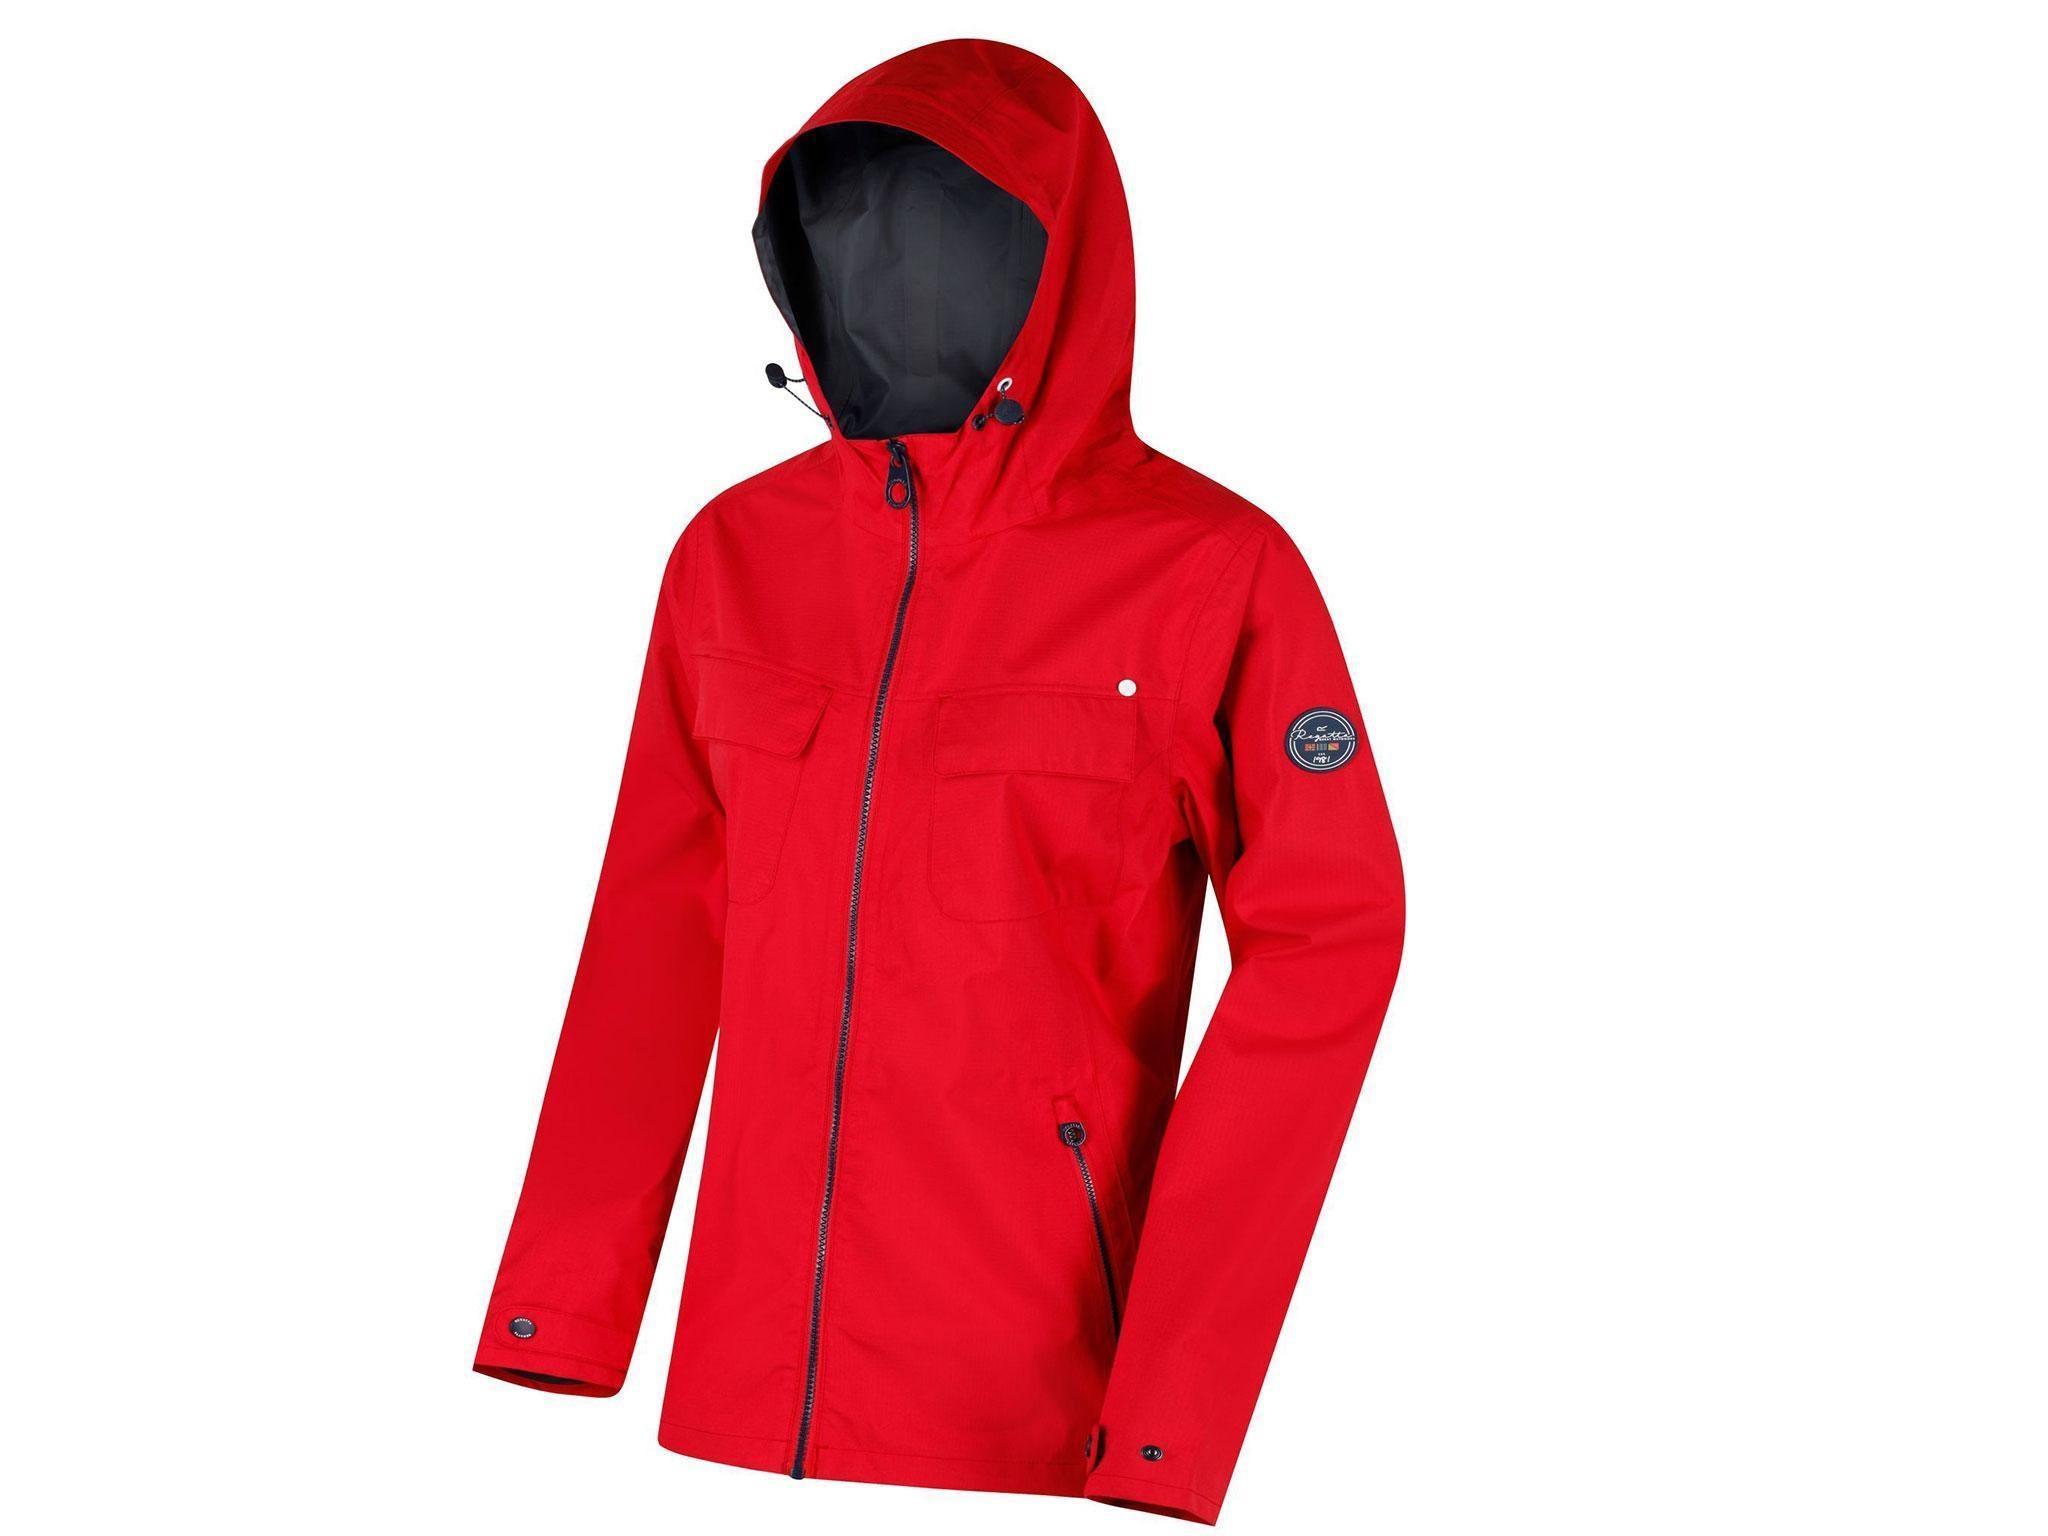 a2260bb94757 Regatta Women s Jakeisha Waterproof Shell Jacket  £56.66, Amazon